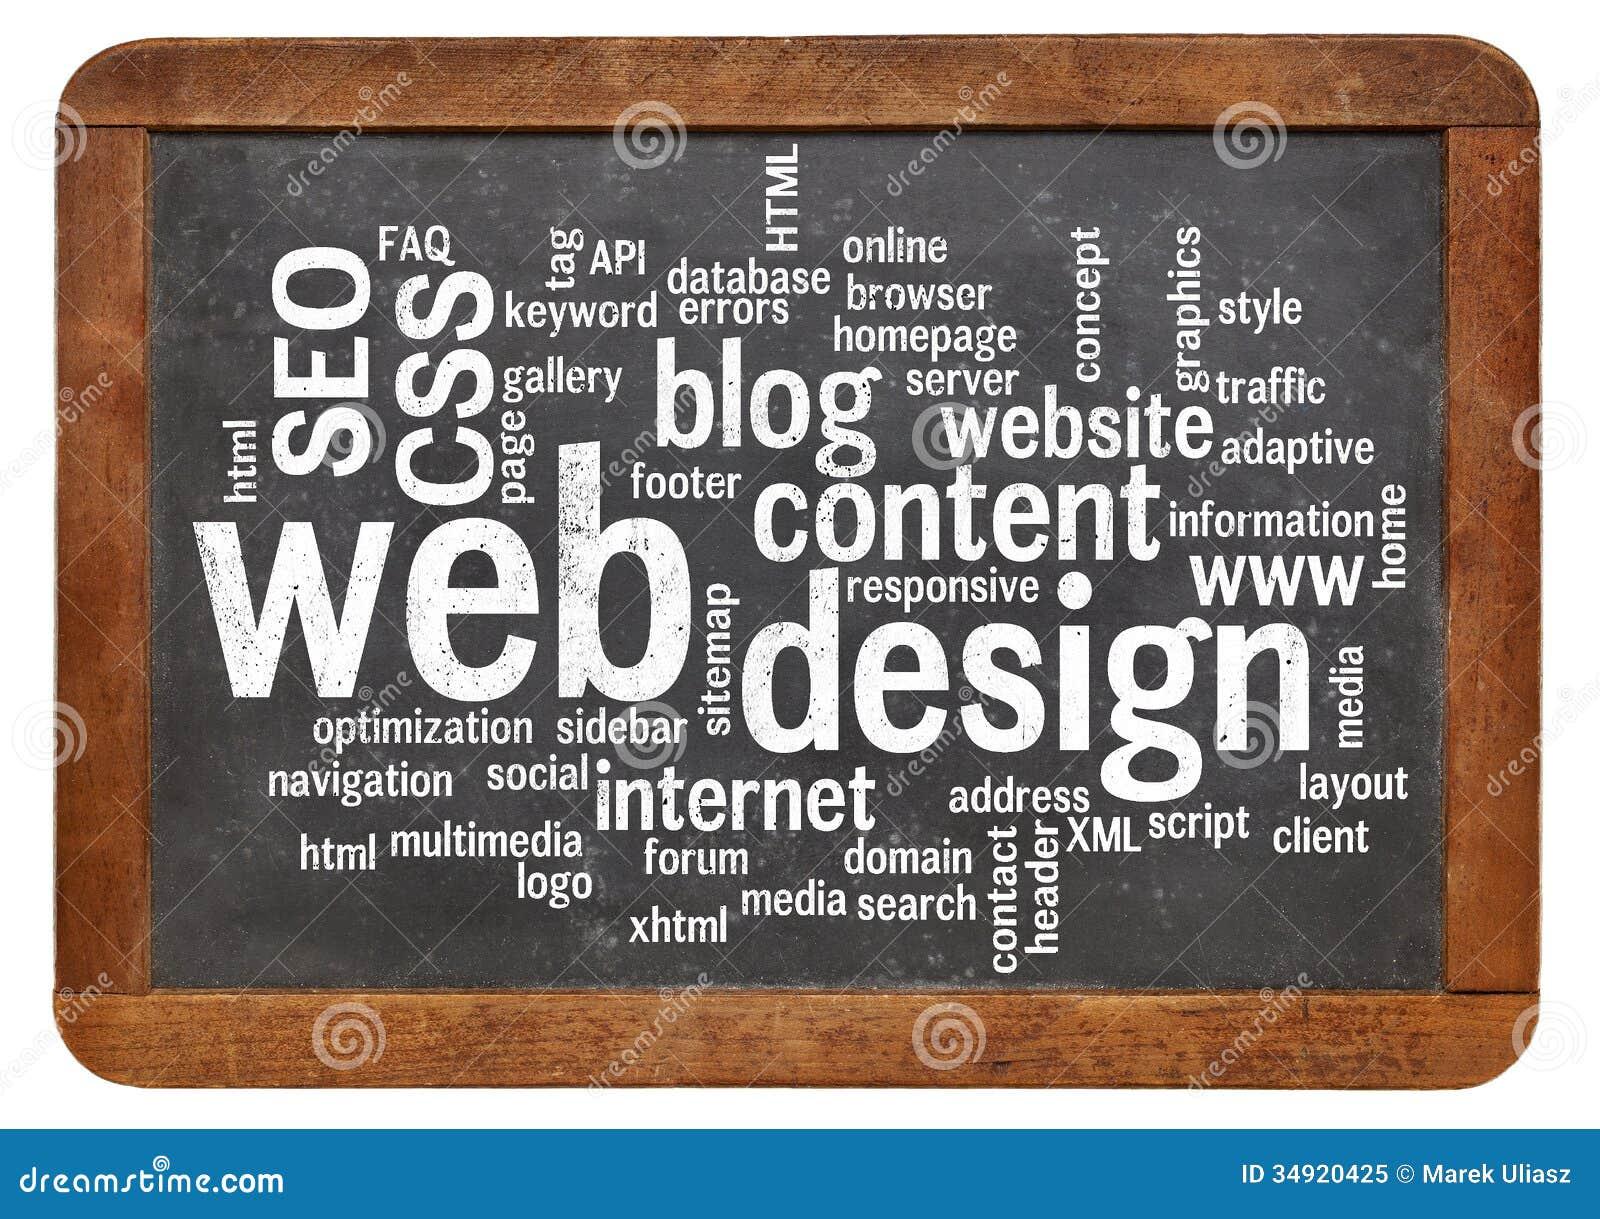 web design word cloud on blackboard stock image image of layout